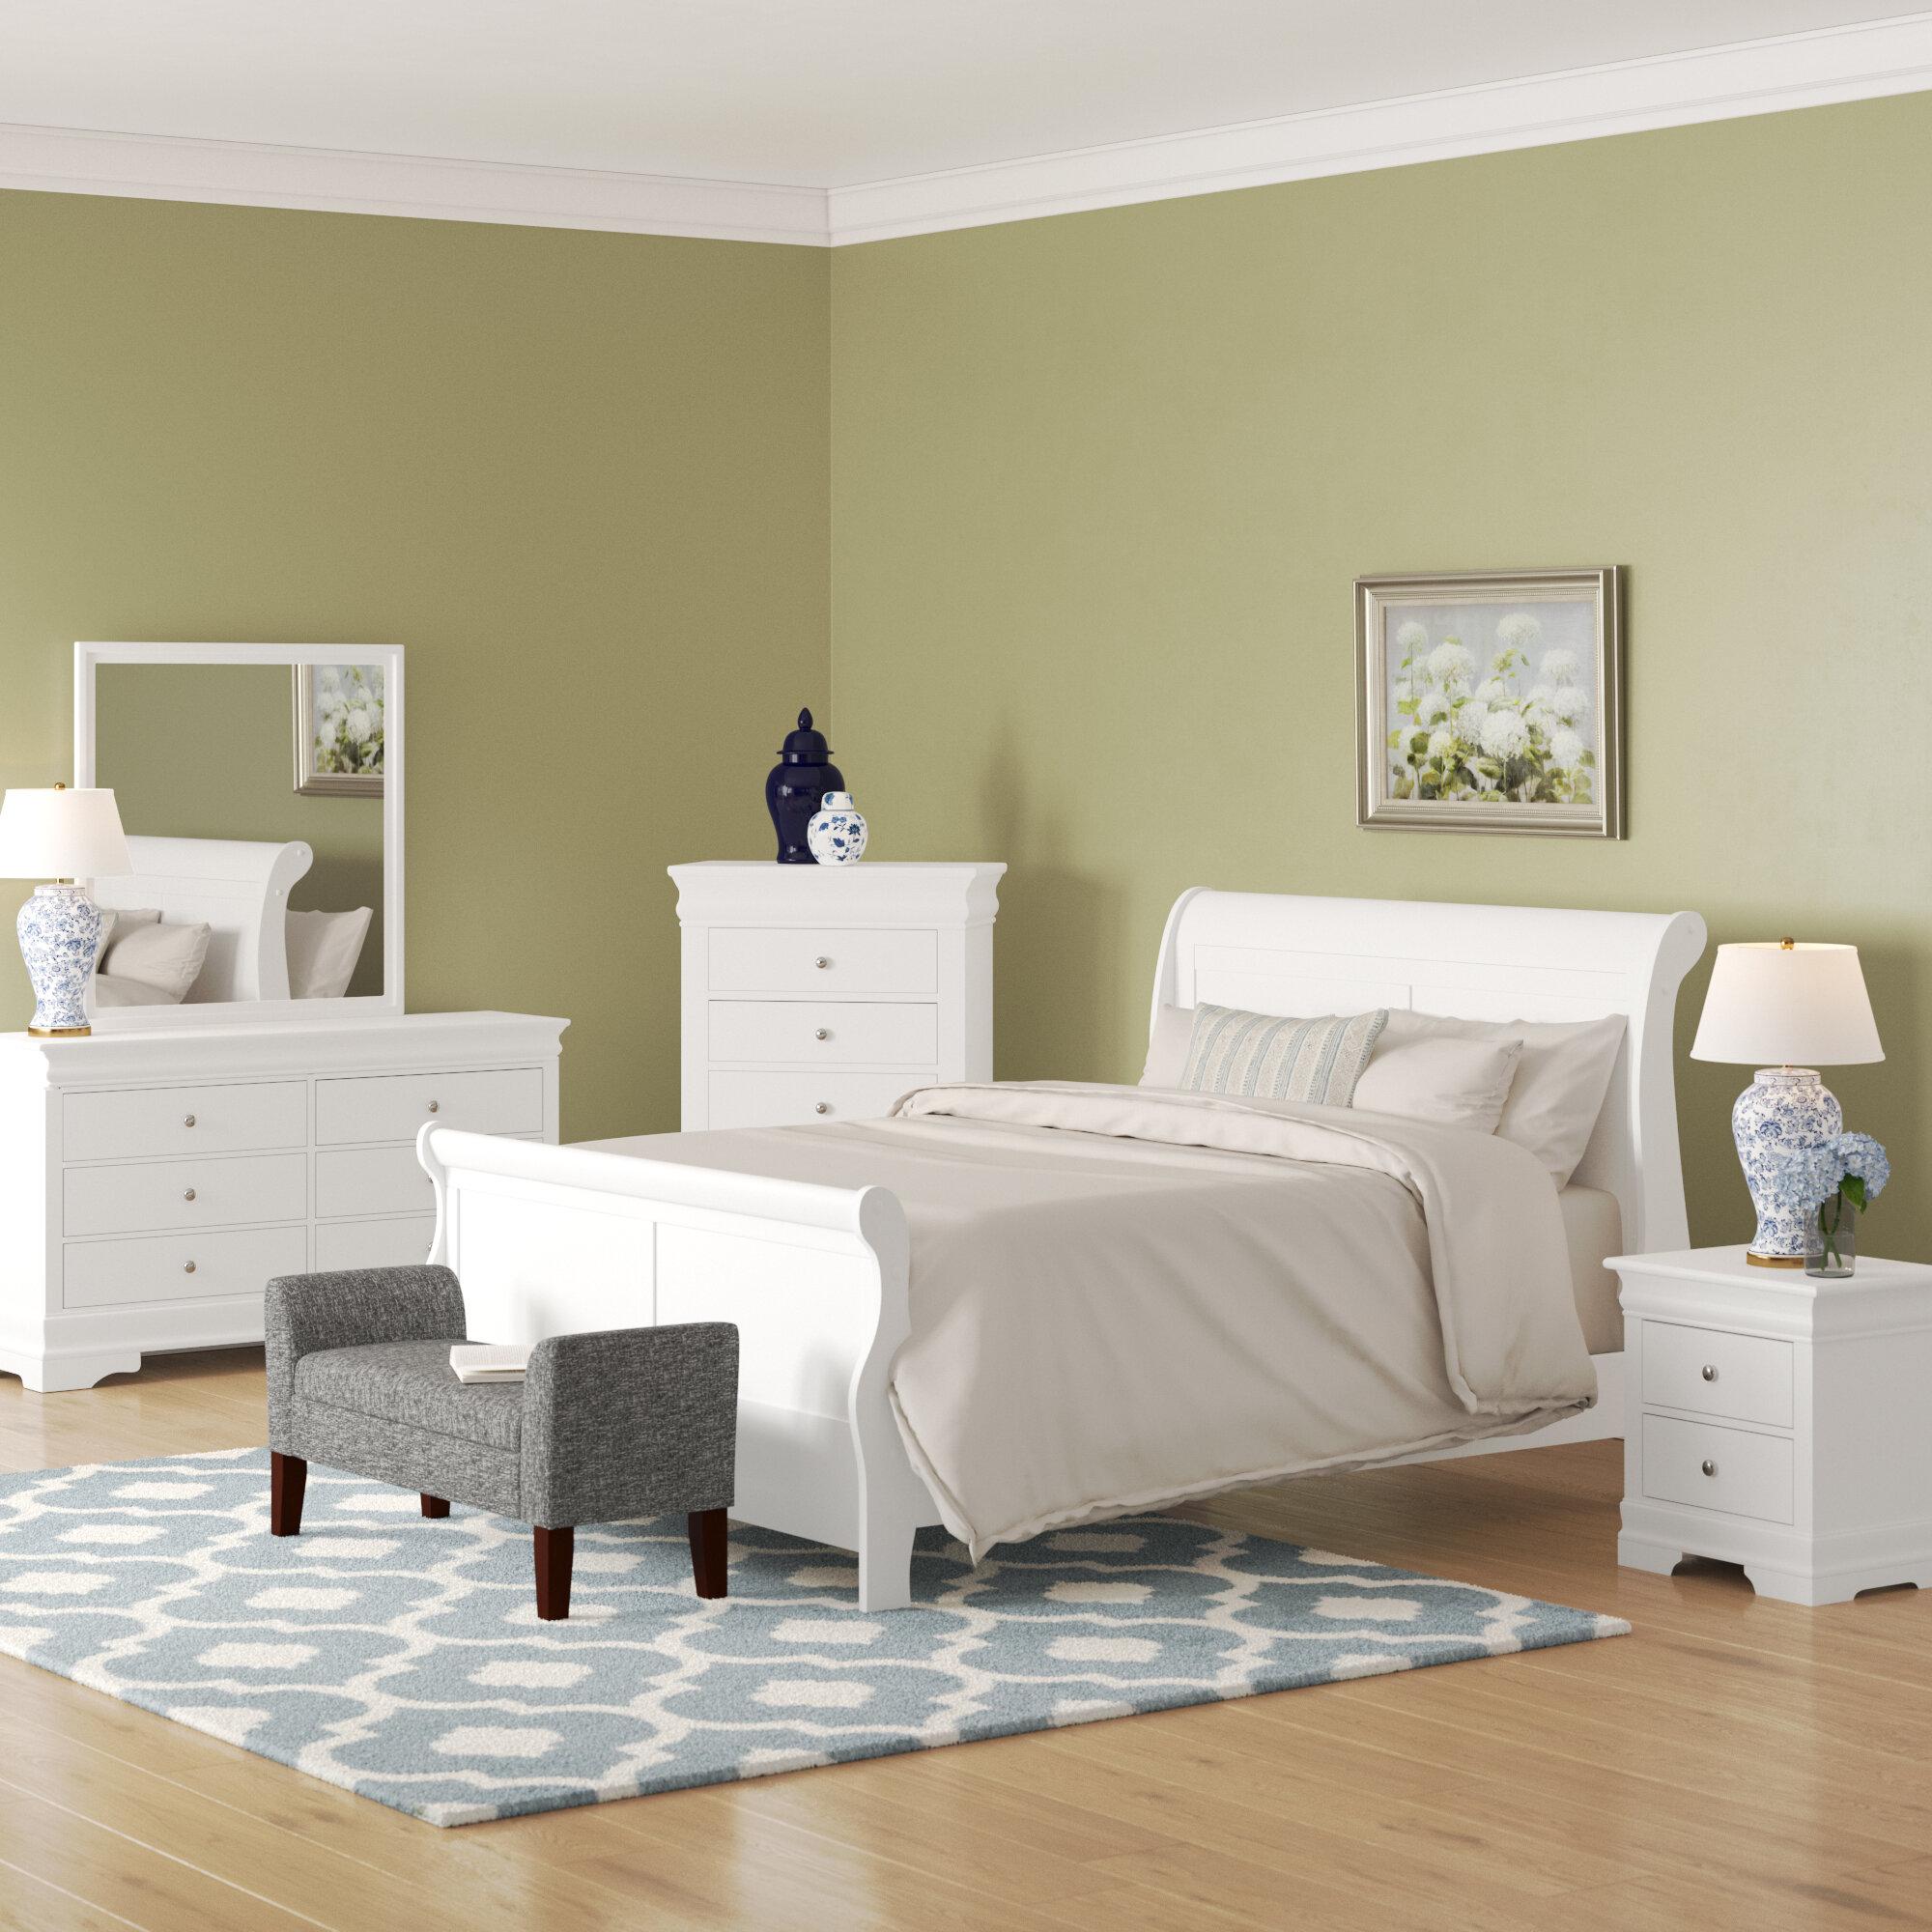 Alcott Hill Julie Queen Sleigh 5 Piece Bedroom Set | Wayfair